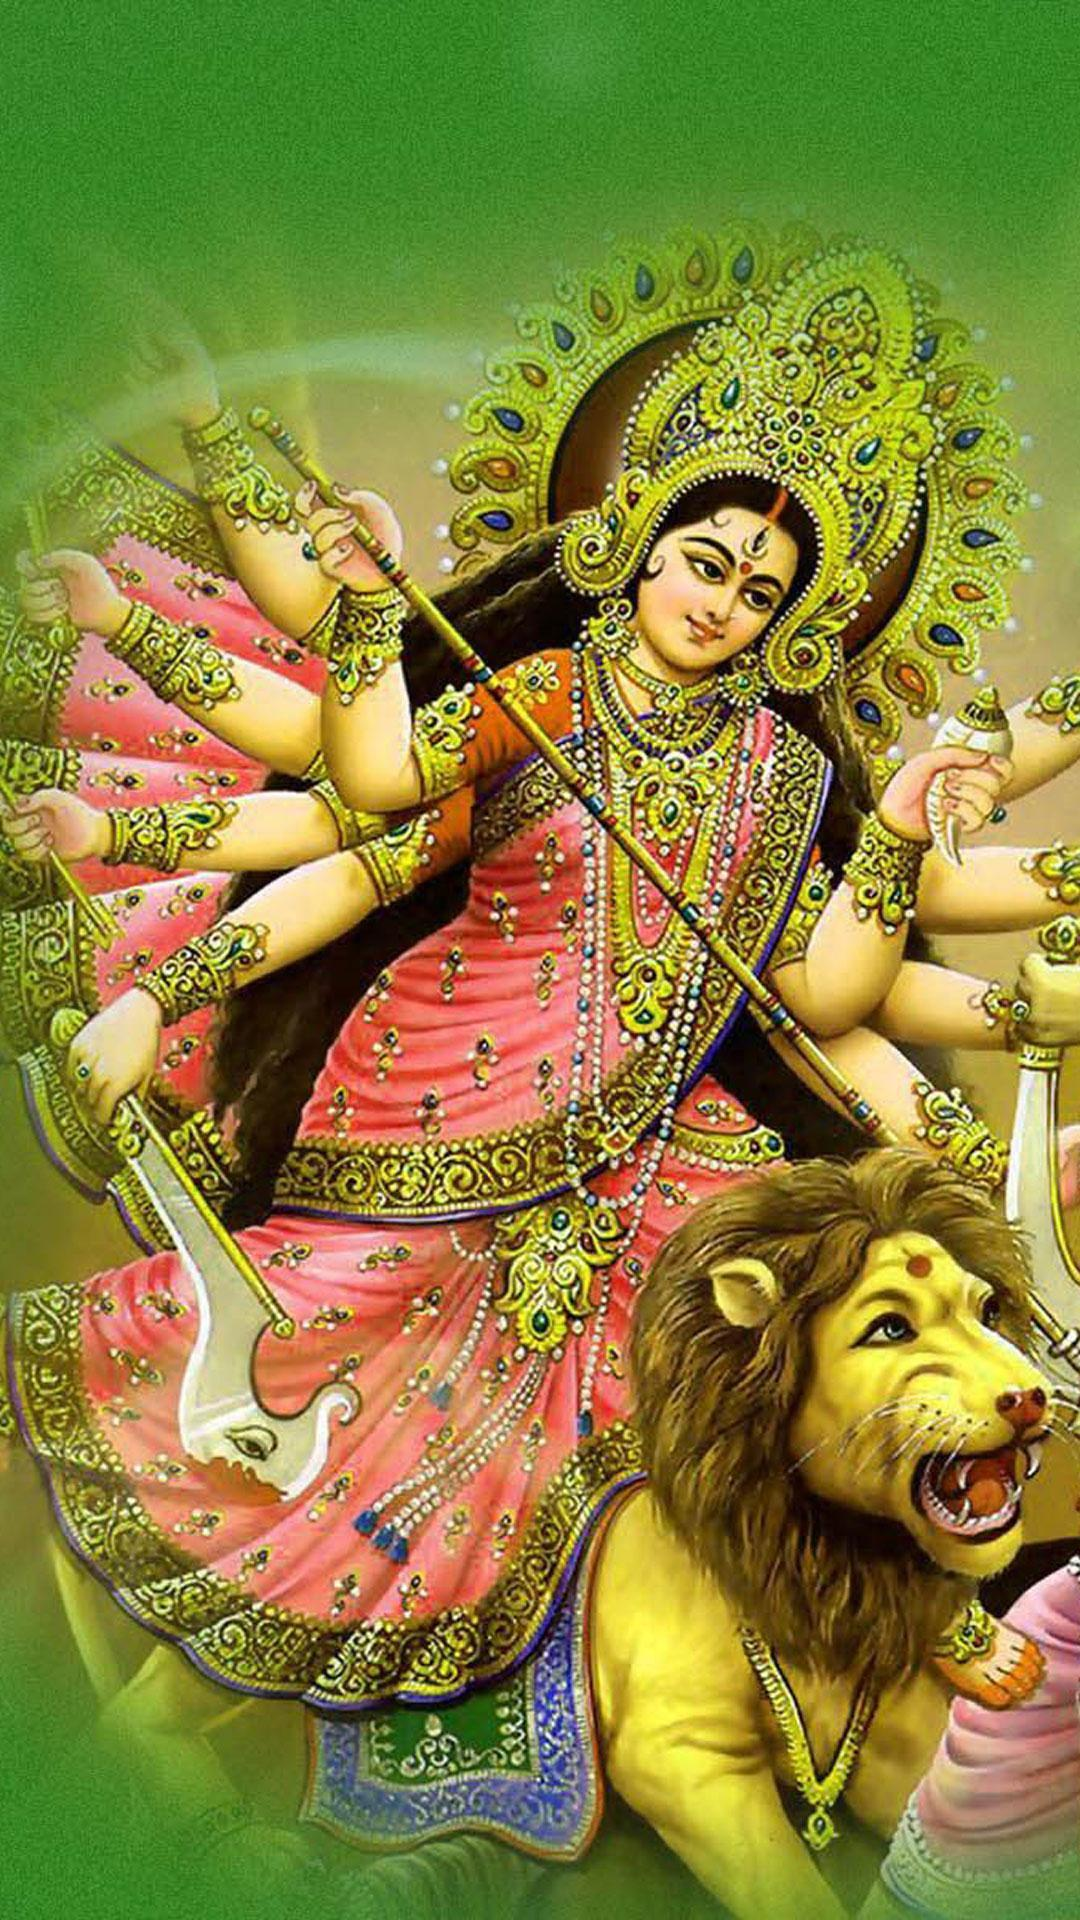 Maa Durga Close Up HD Wallpaper Photos For Desktop PC - HD